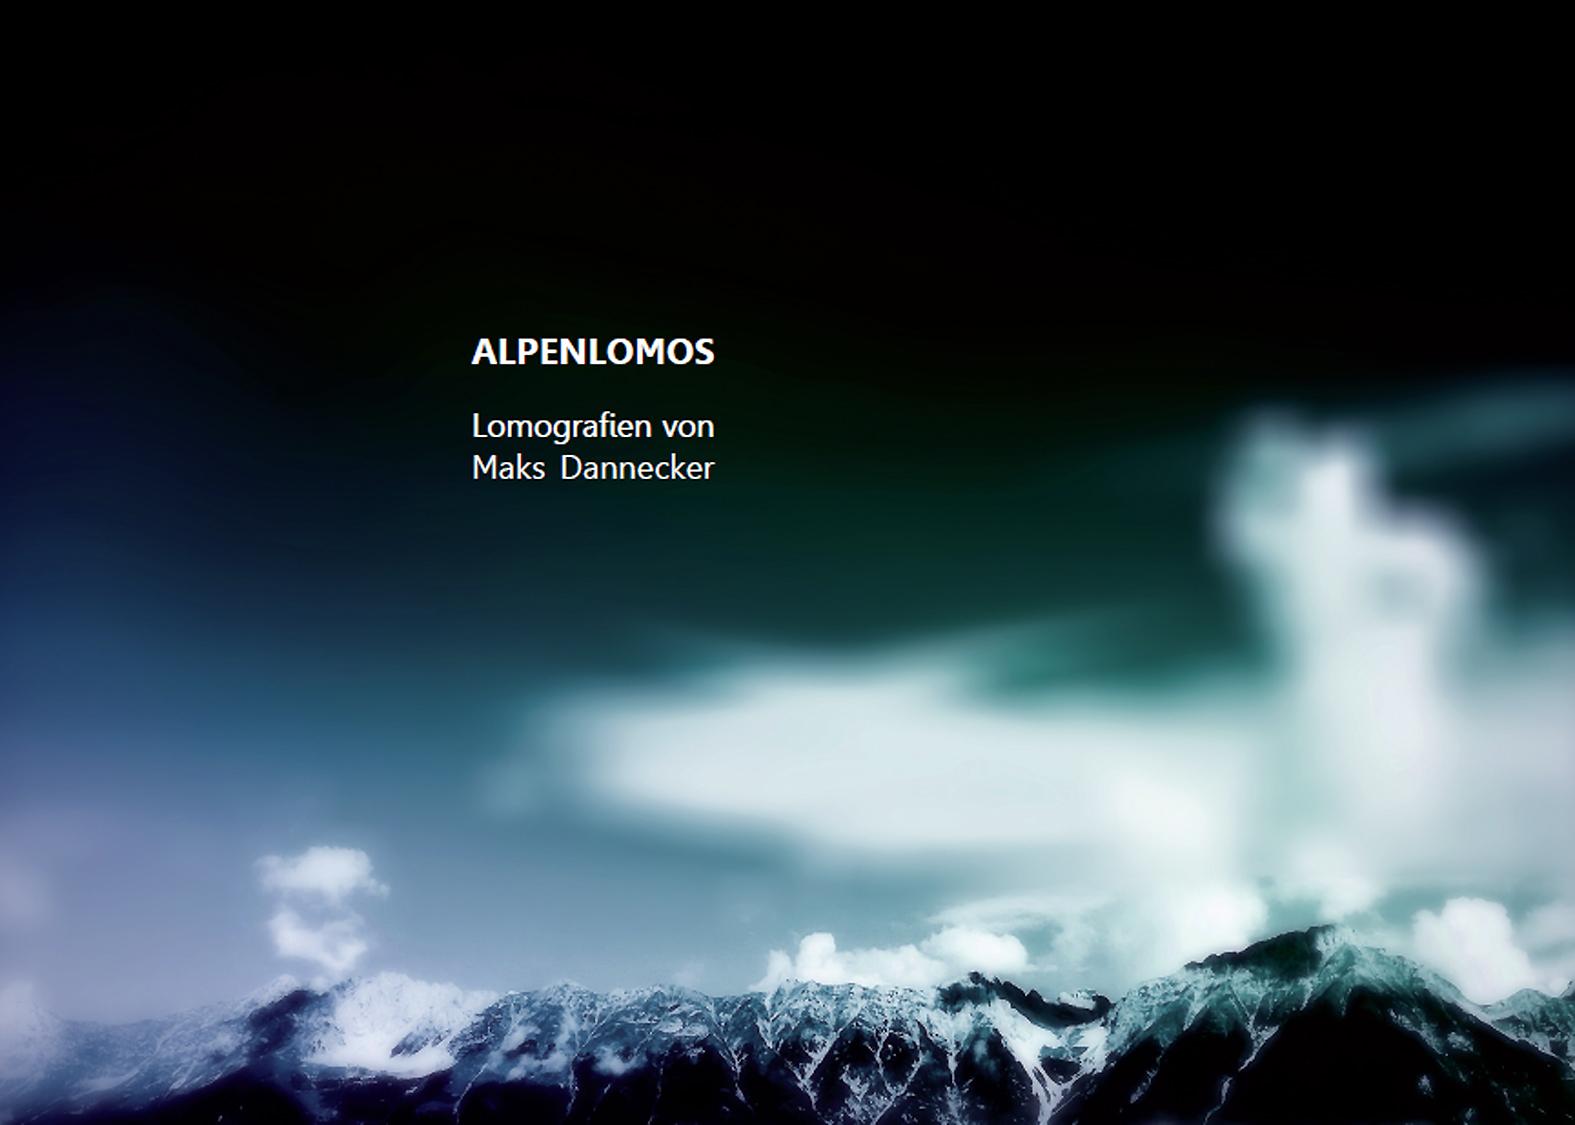 Alpenlomos | Lomografien